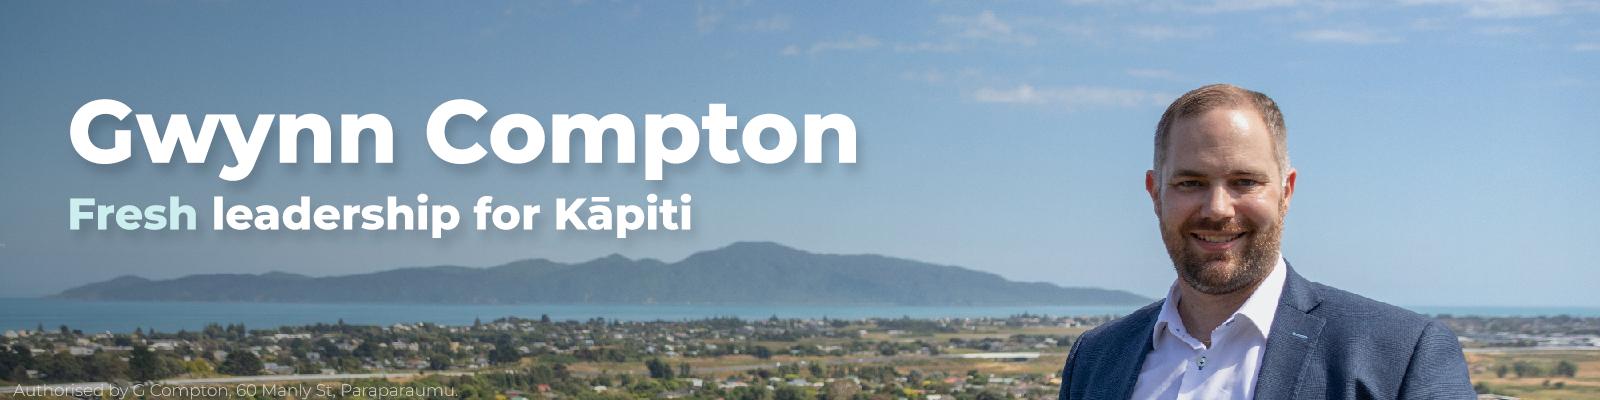 Gwynn Compton Fresh Leadership for Kapiti Banner.png